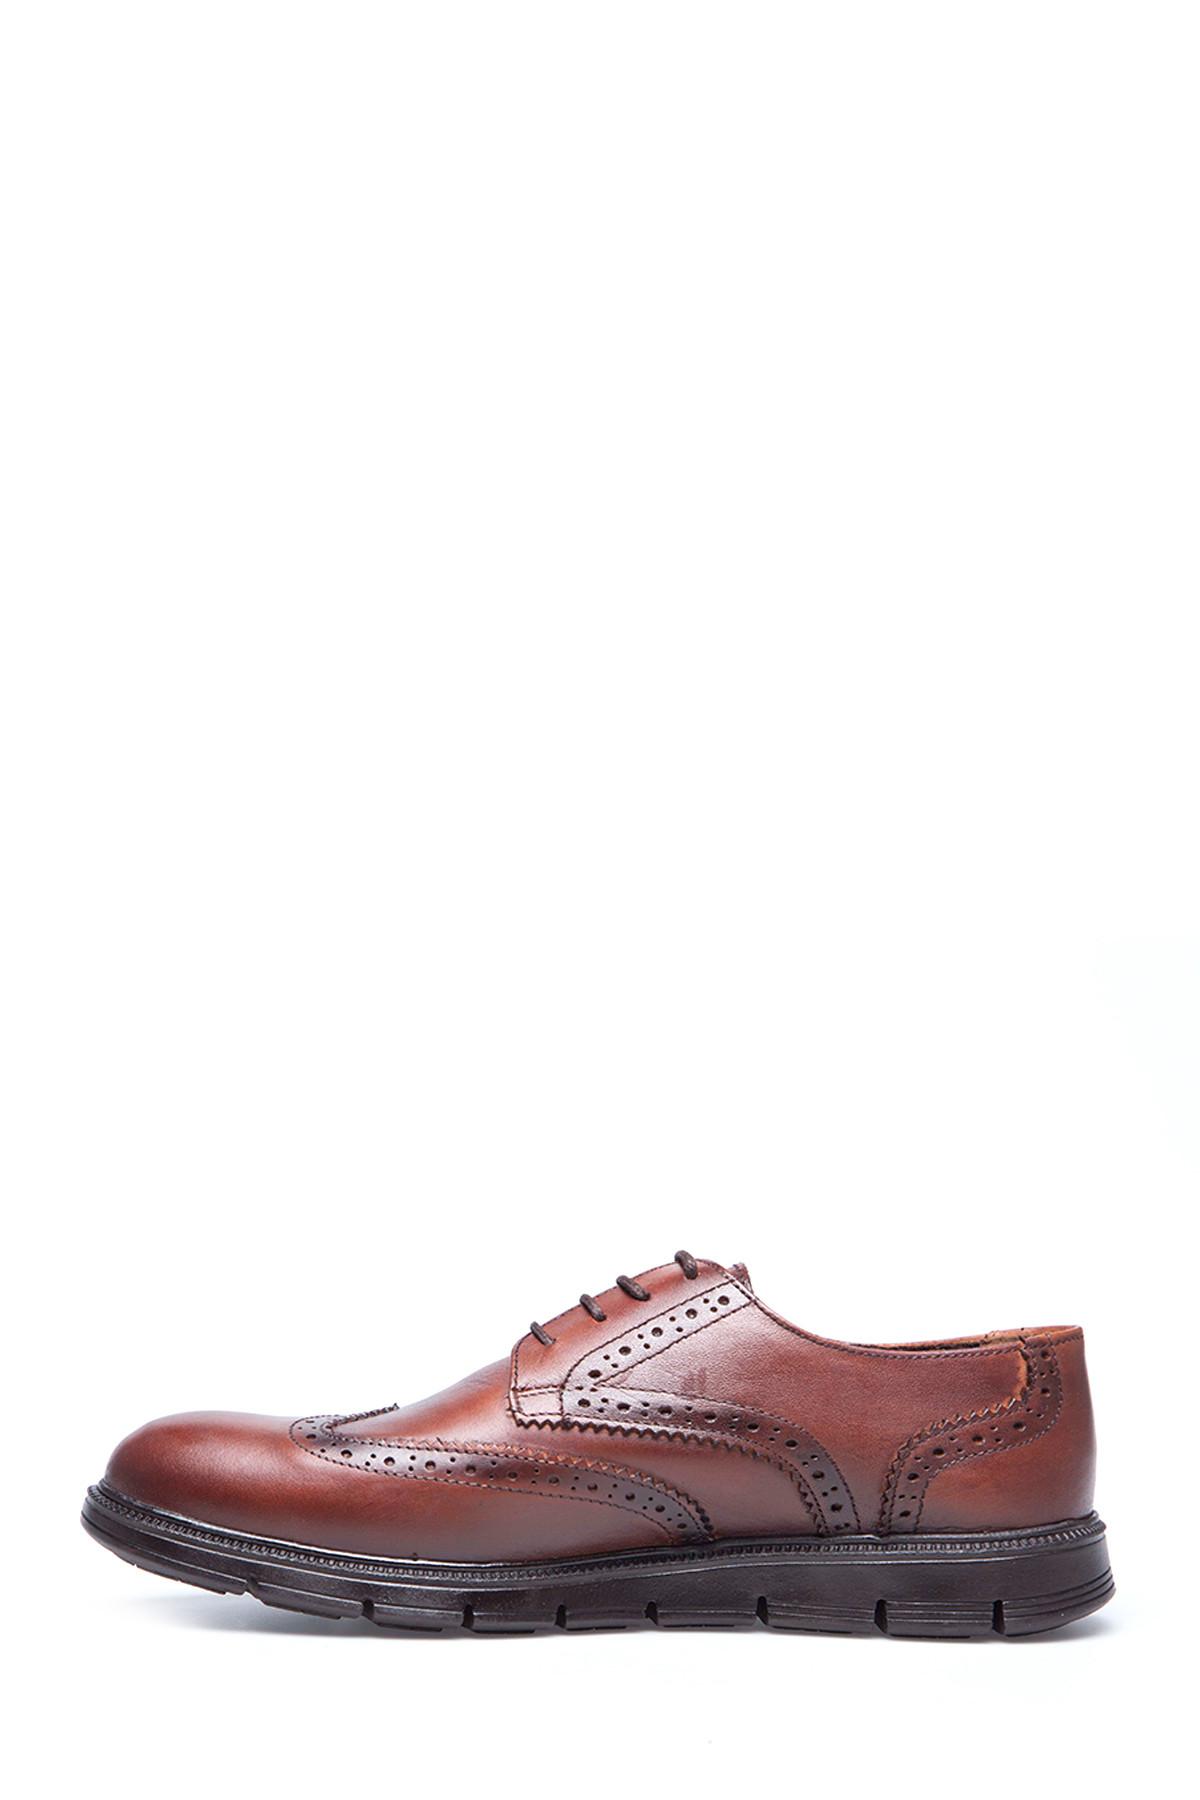 MERCEDES Erkek Taba Casual Ayakkabı - Alfonso 2